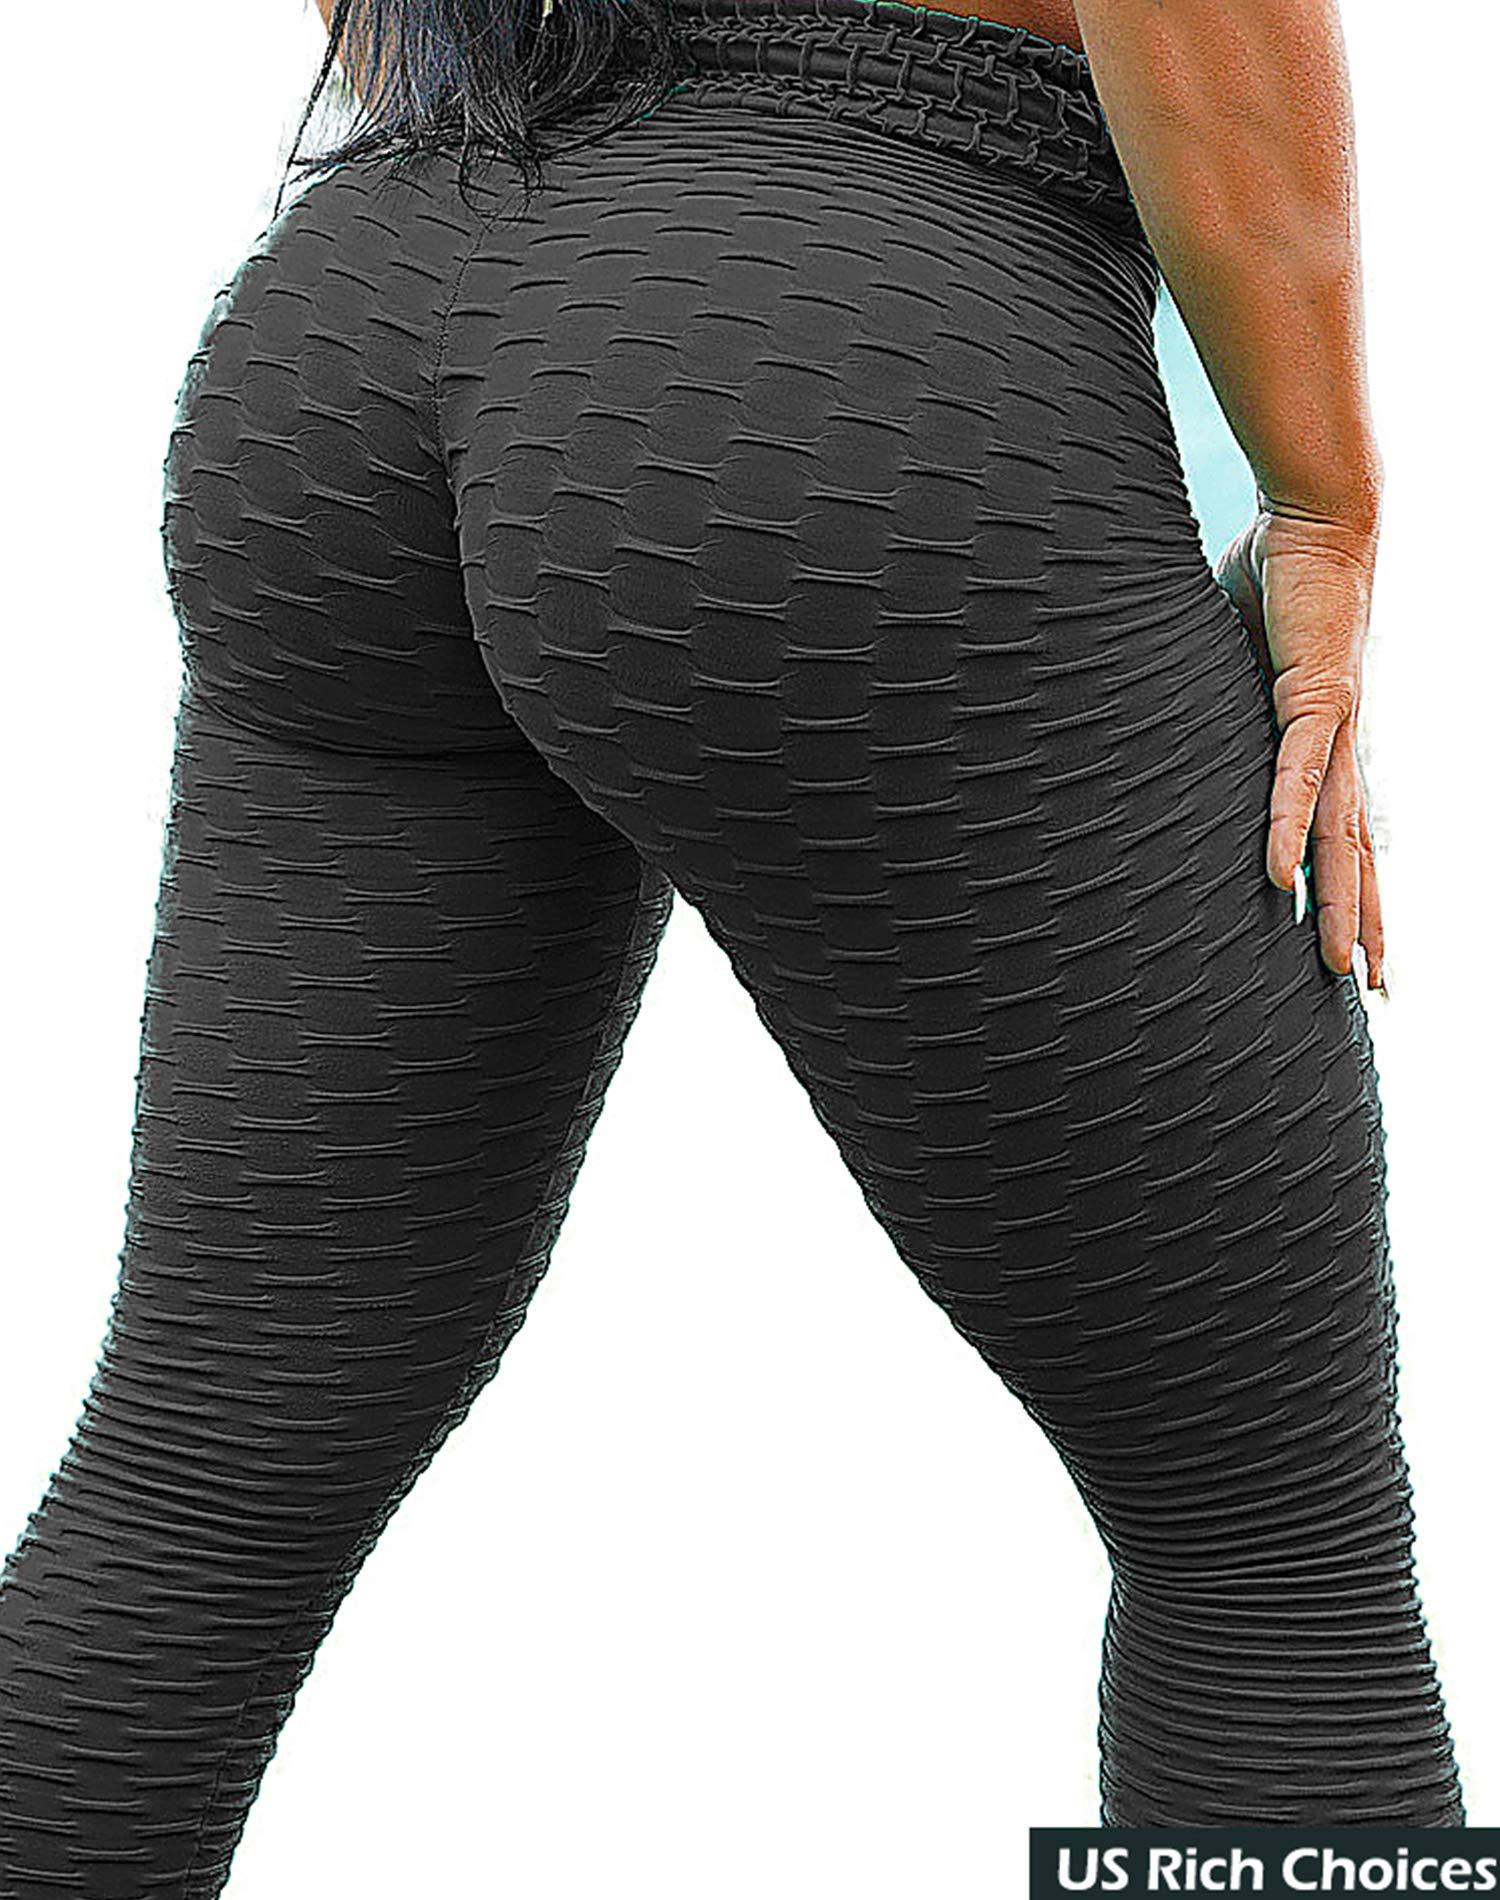 SEASUM Women's High Waist Yoga Pants Tummy Control Slimming Booty Leggings Workout Running Butt Lift Tights S